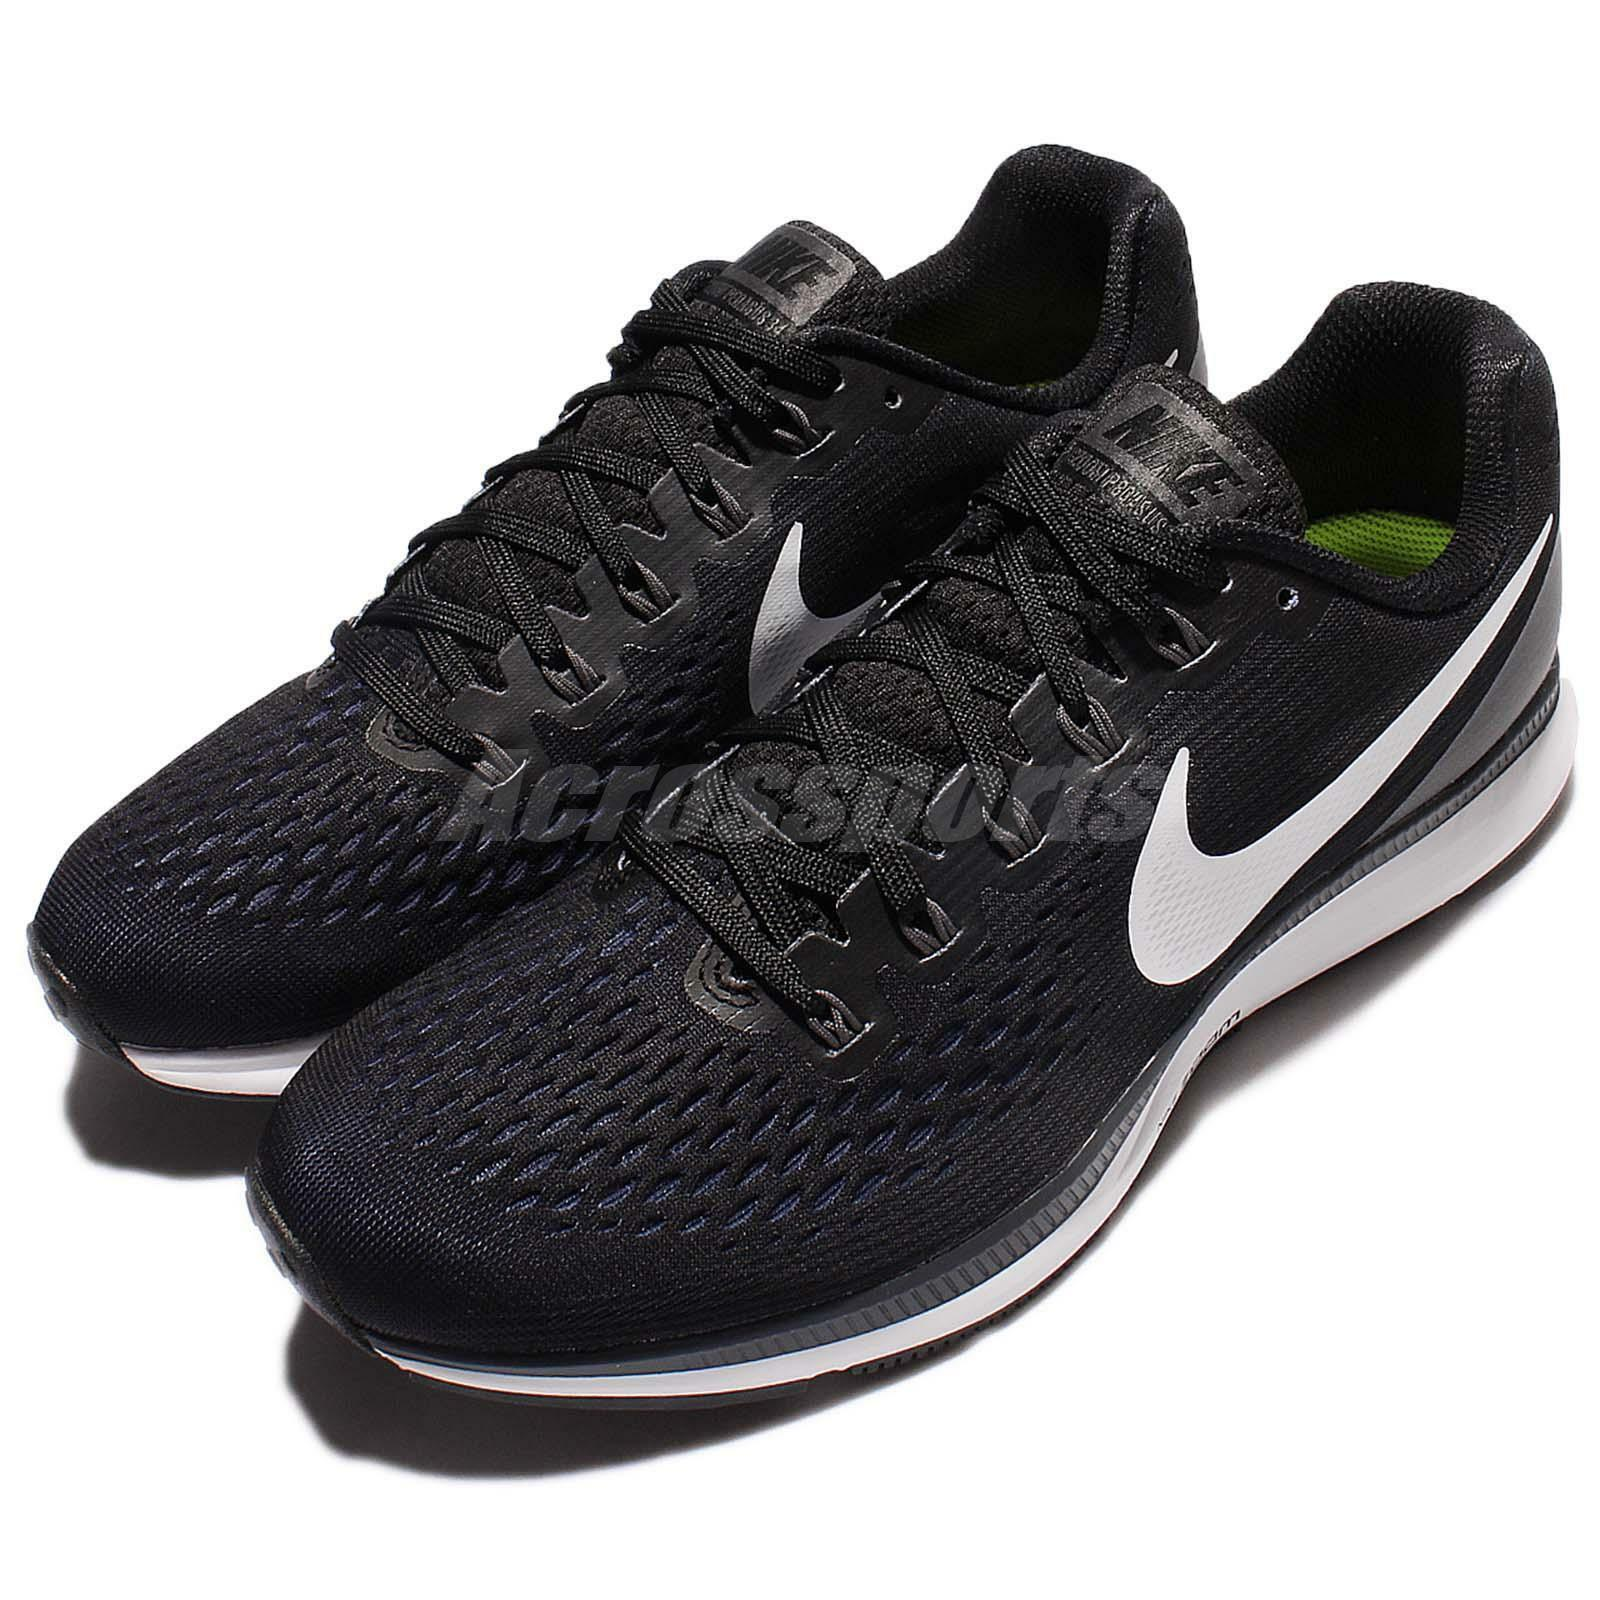 Nike Air Zoom Pegasus 34 Black White Men Running Shoes Sneakers 880555-001